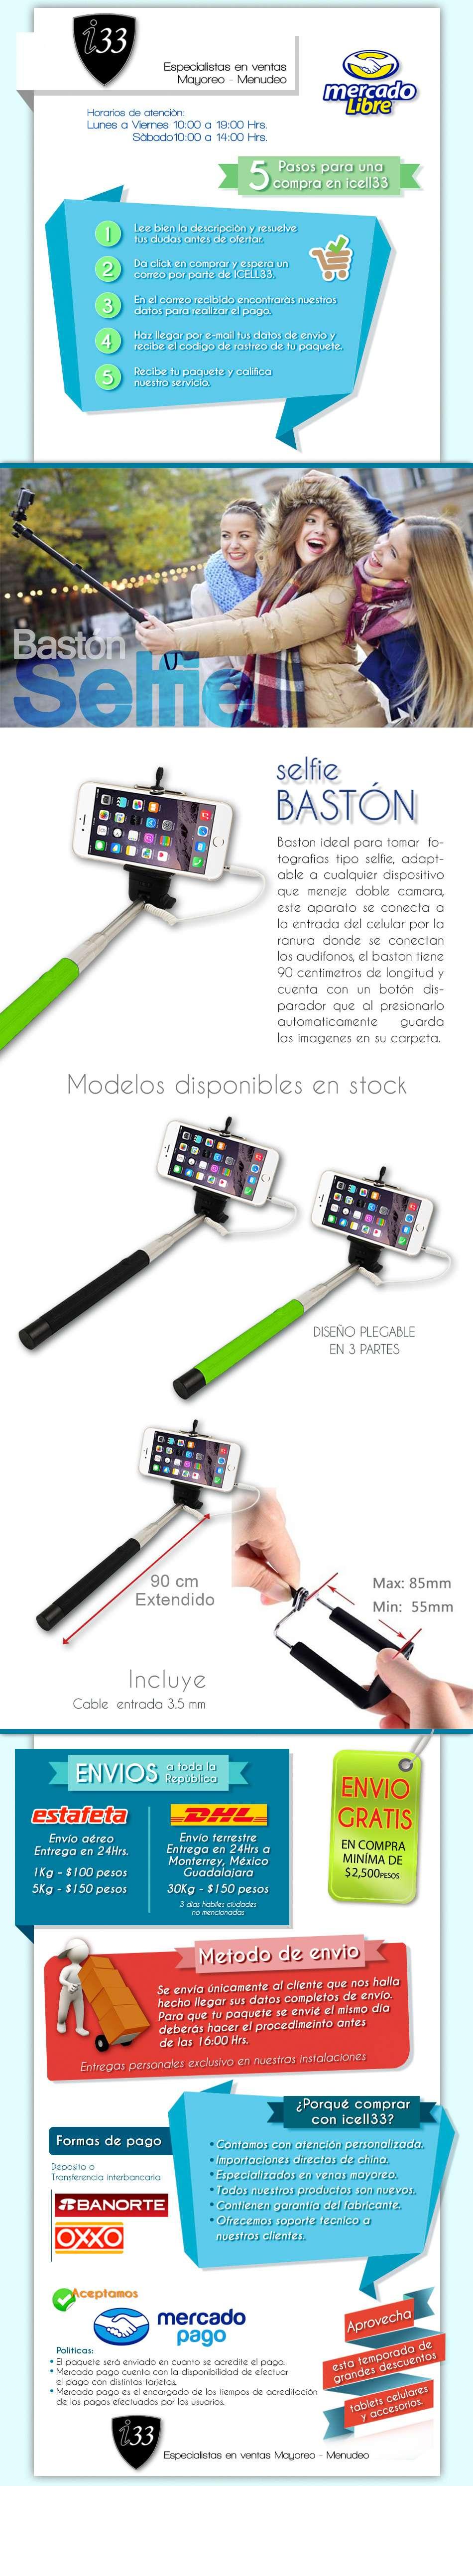 selfie stick monopie iphone samsumg y lg distintos colores en merca. Black Bedroom Furniture Sets. Home Design Ideas